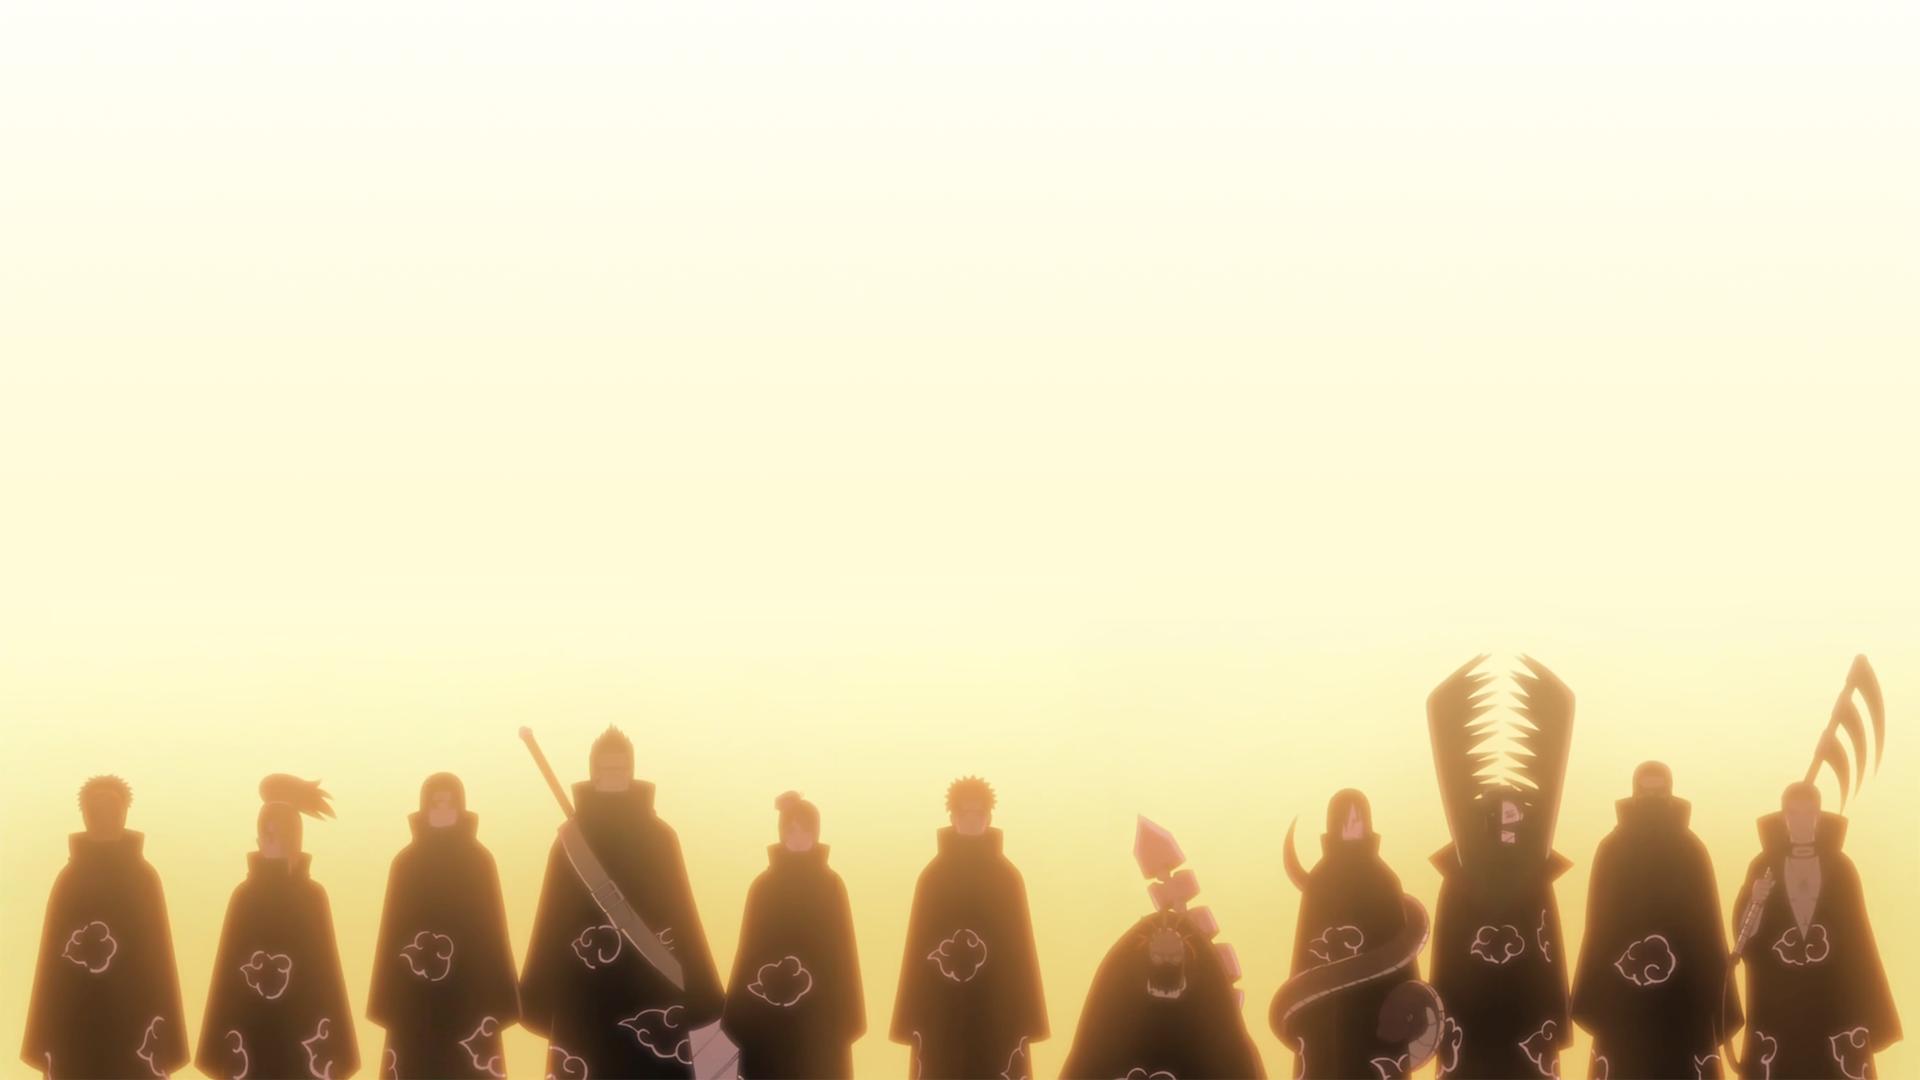 Download Akatsuki Backgrounds 1920x1080